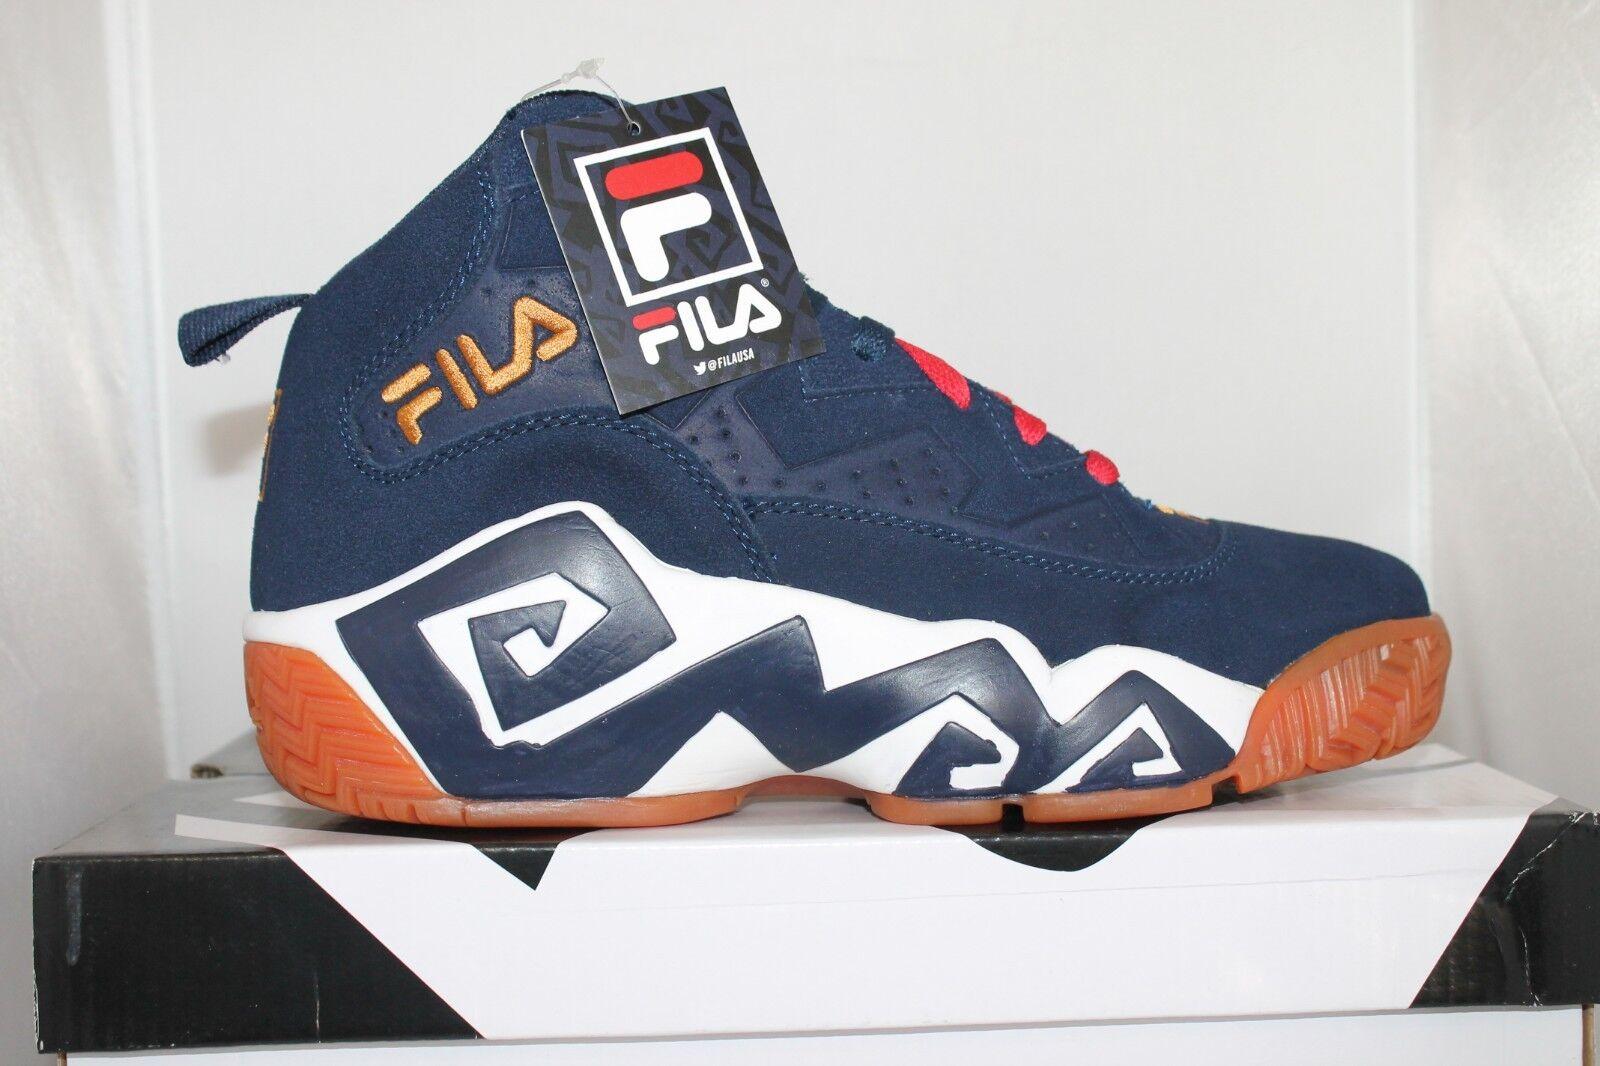 Mens Fila MB Jamal Mashburn Retro Basketball shoes Sneakers Navy White gold